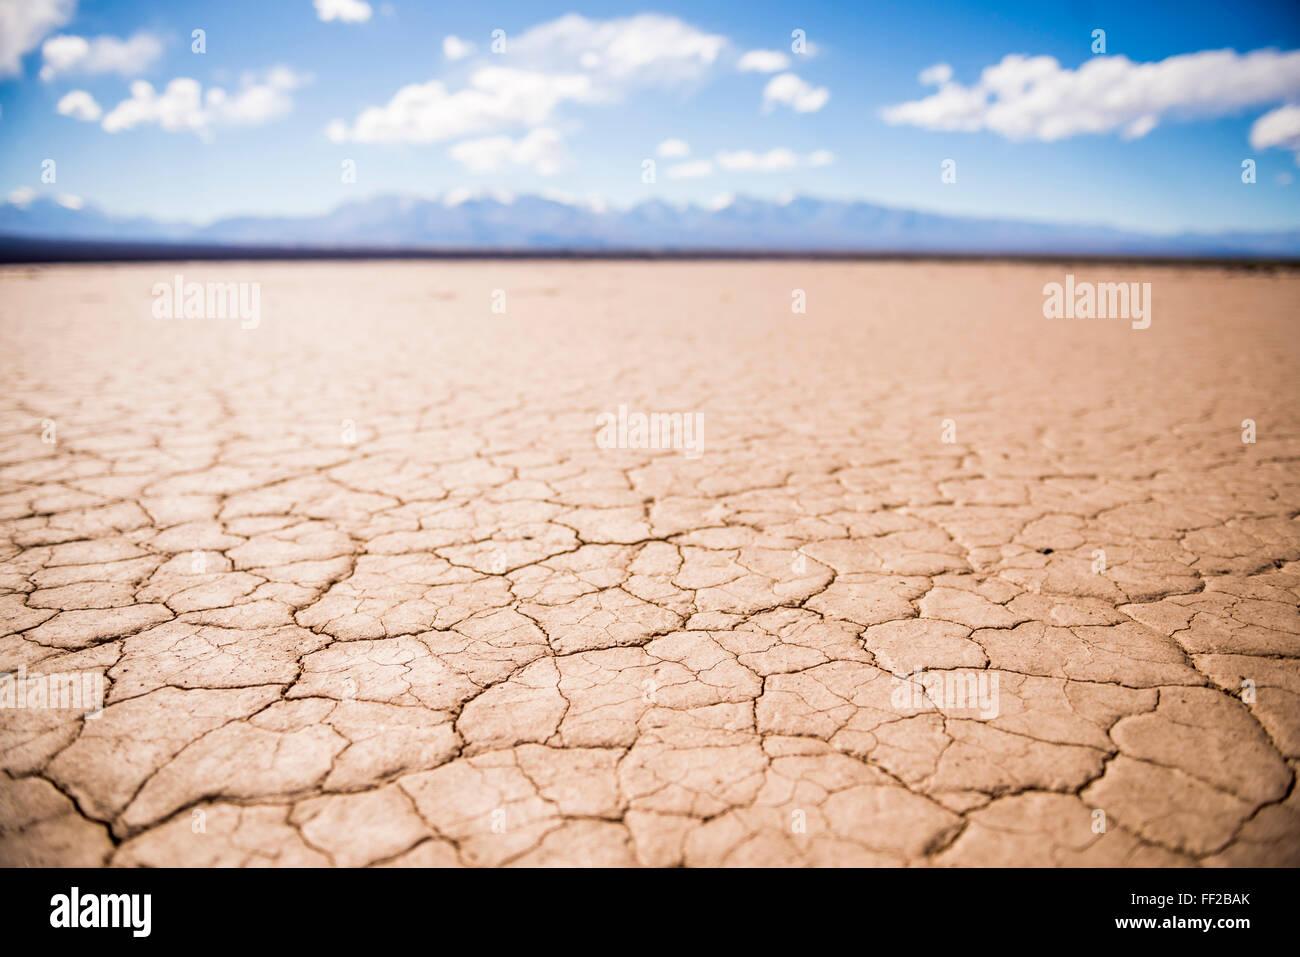 ERM BarreaRM BRManco de RMa Pampa deRM RMeoncito, a dried river bed at BarreaRM, San Juan Province, Argentina, South - Stock Image